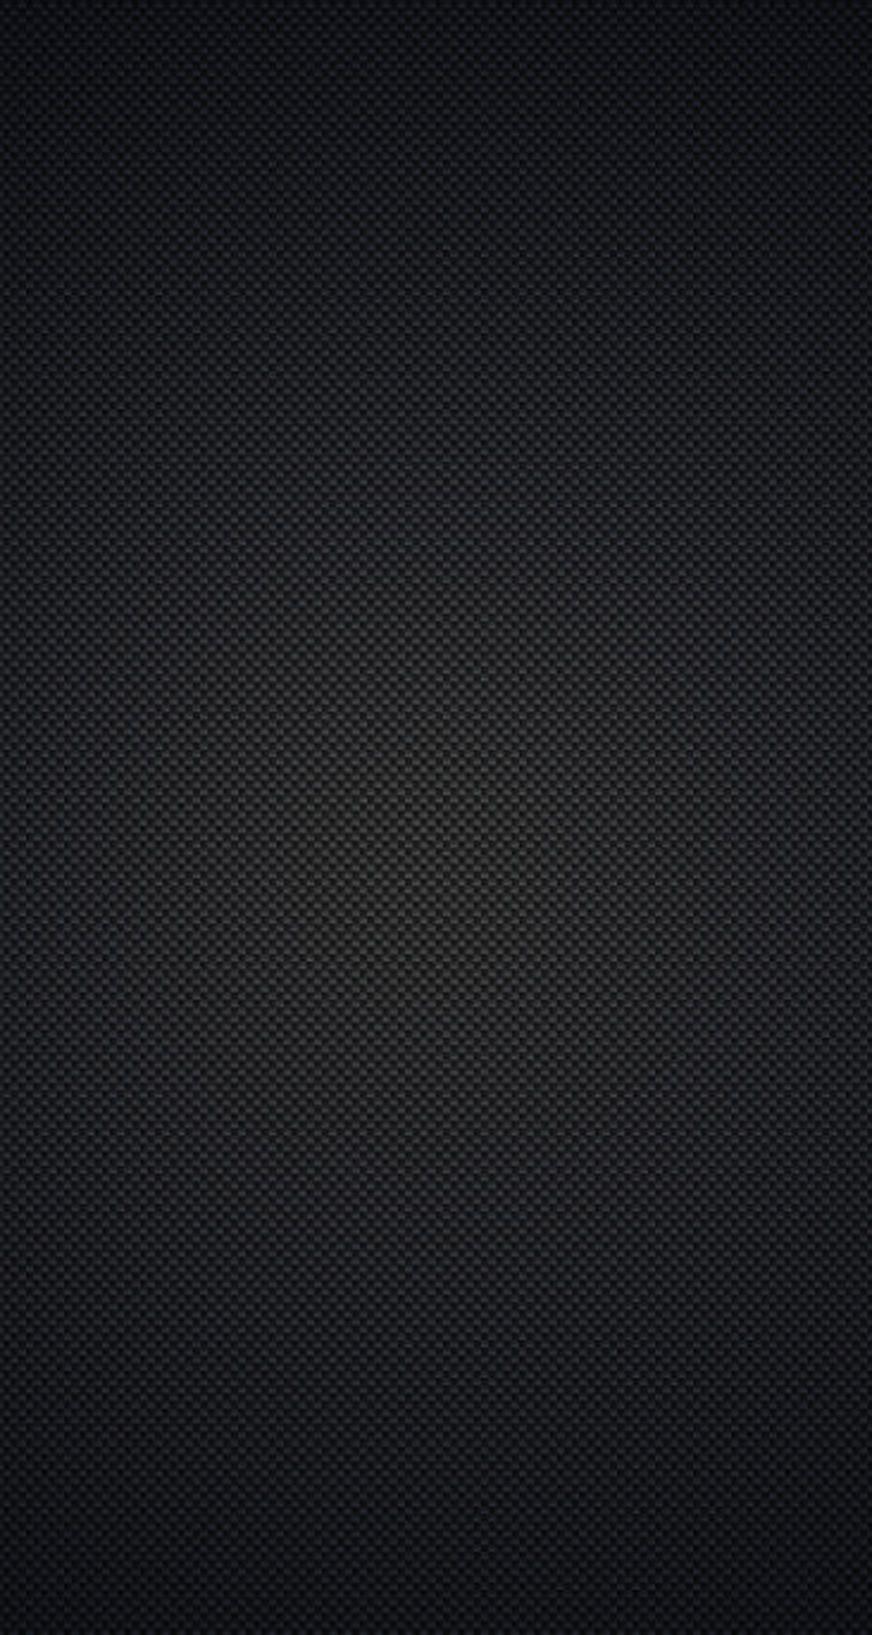 Iphone 7 Wallpaper Iphone7 Wallpaper Minimal Black Wallpaper Iphone Phone Wallpaper Design Iphone Wallpaper Images